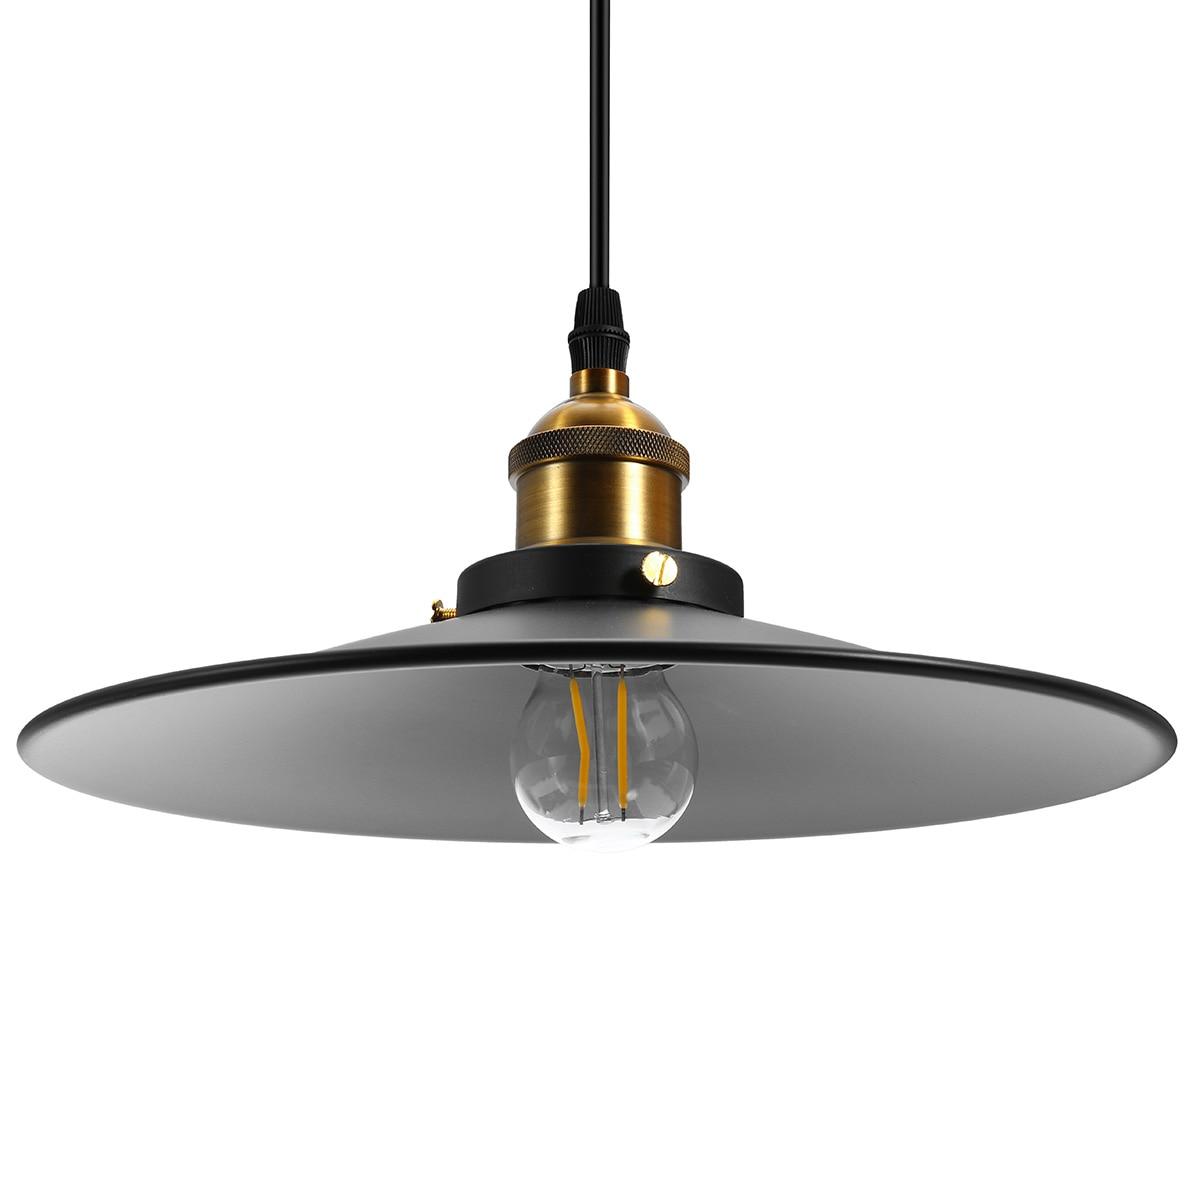 Vintage Metal Iron Pendant Lamp Ceiling Retro Chandelier Light For Garage Living Room Restaurant Bar Decorative Indoor LED Light